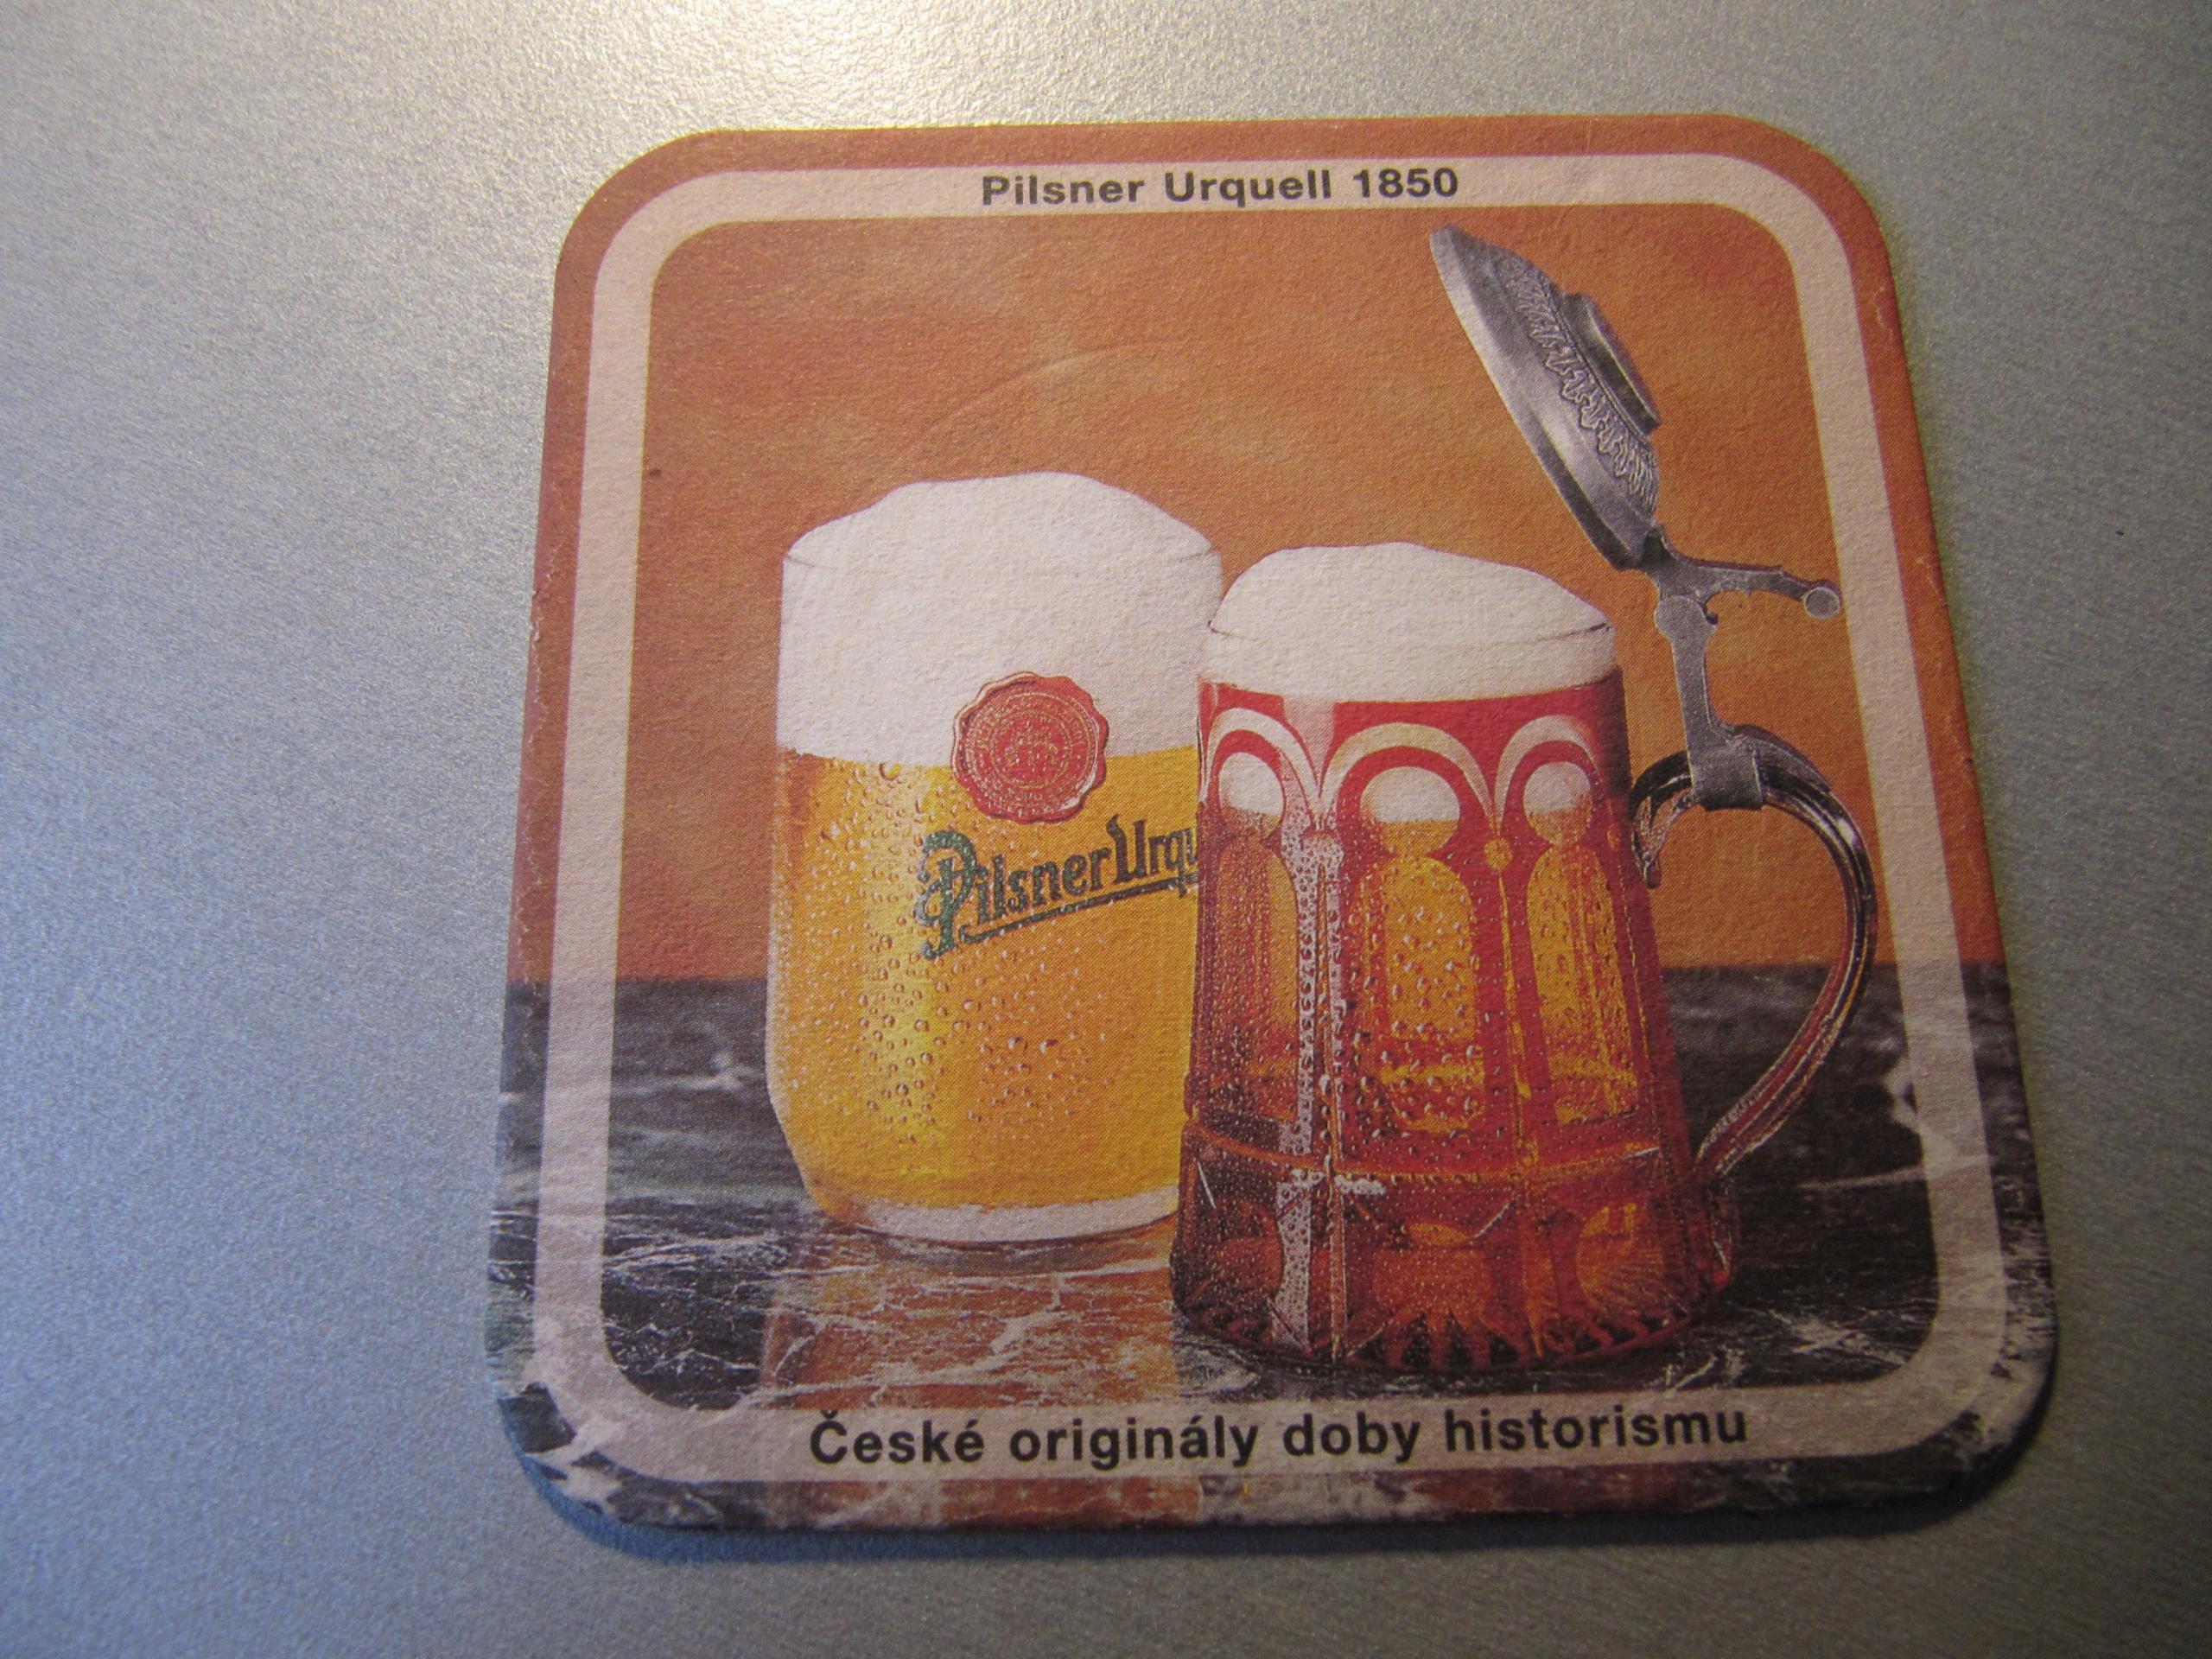 PODSTAWKA PODKŁADKA piwo Pilsner Urquell 2000